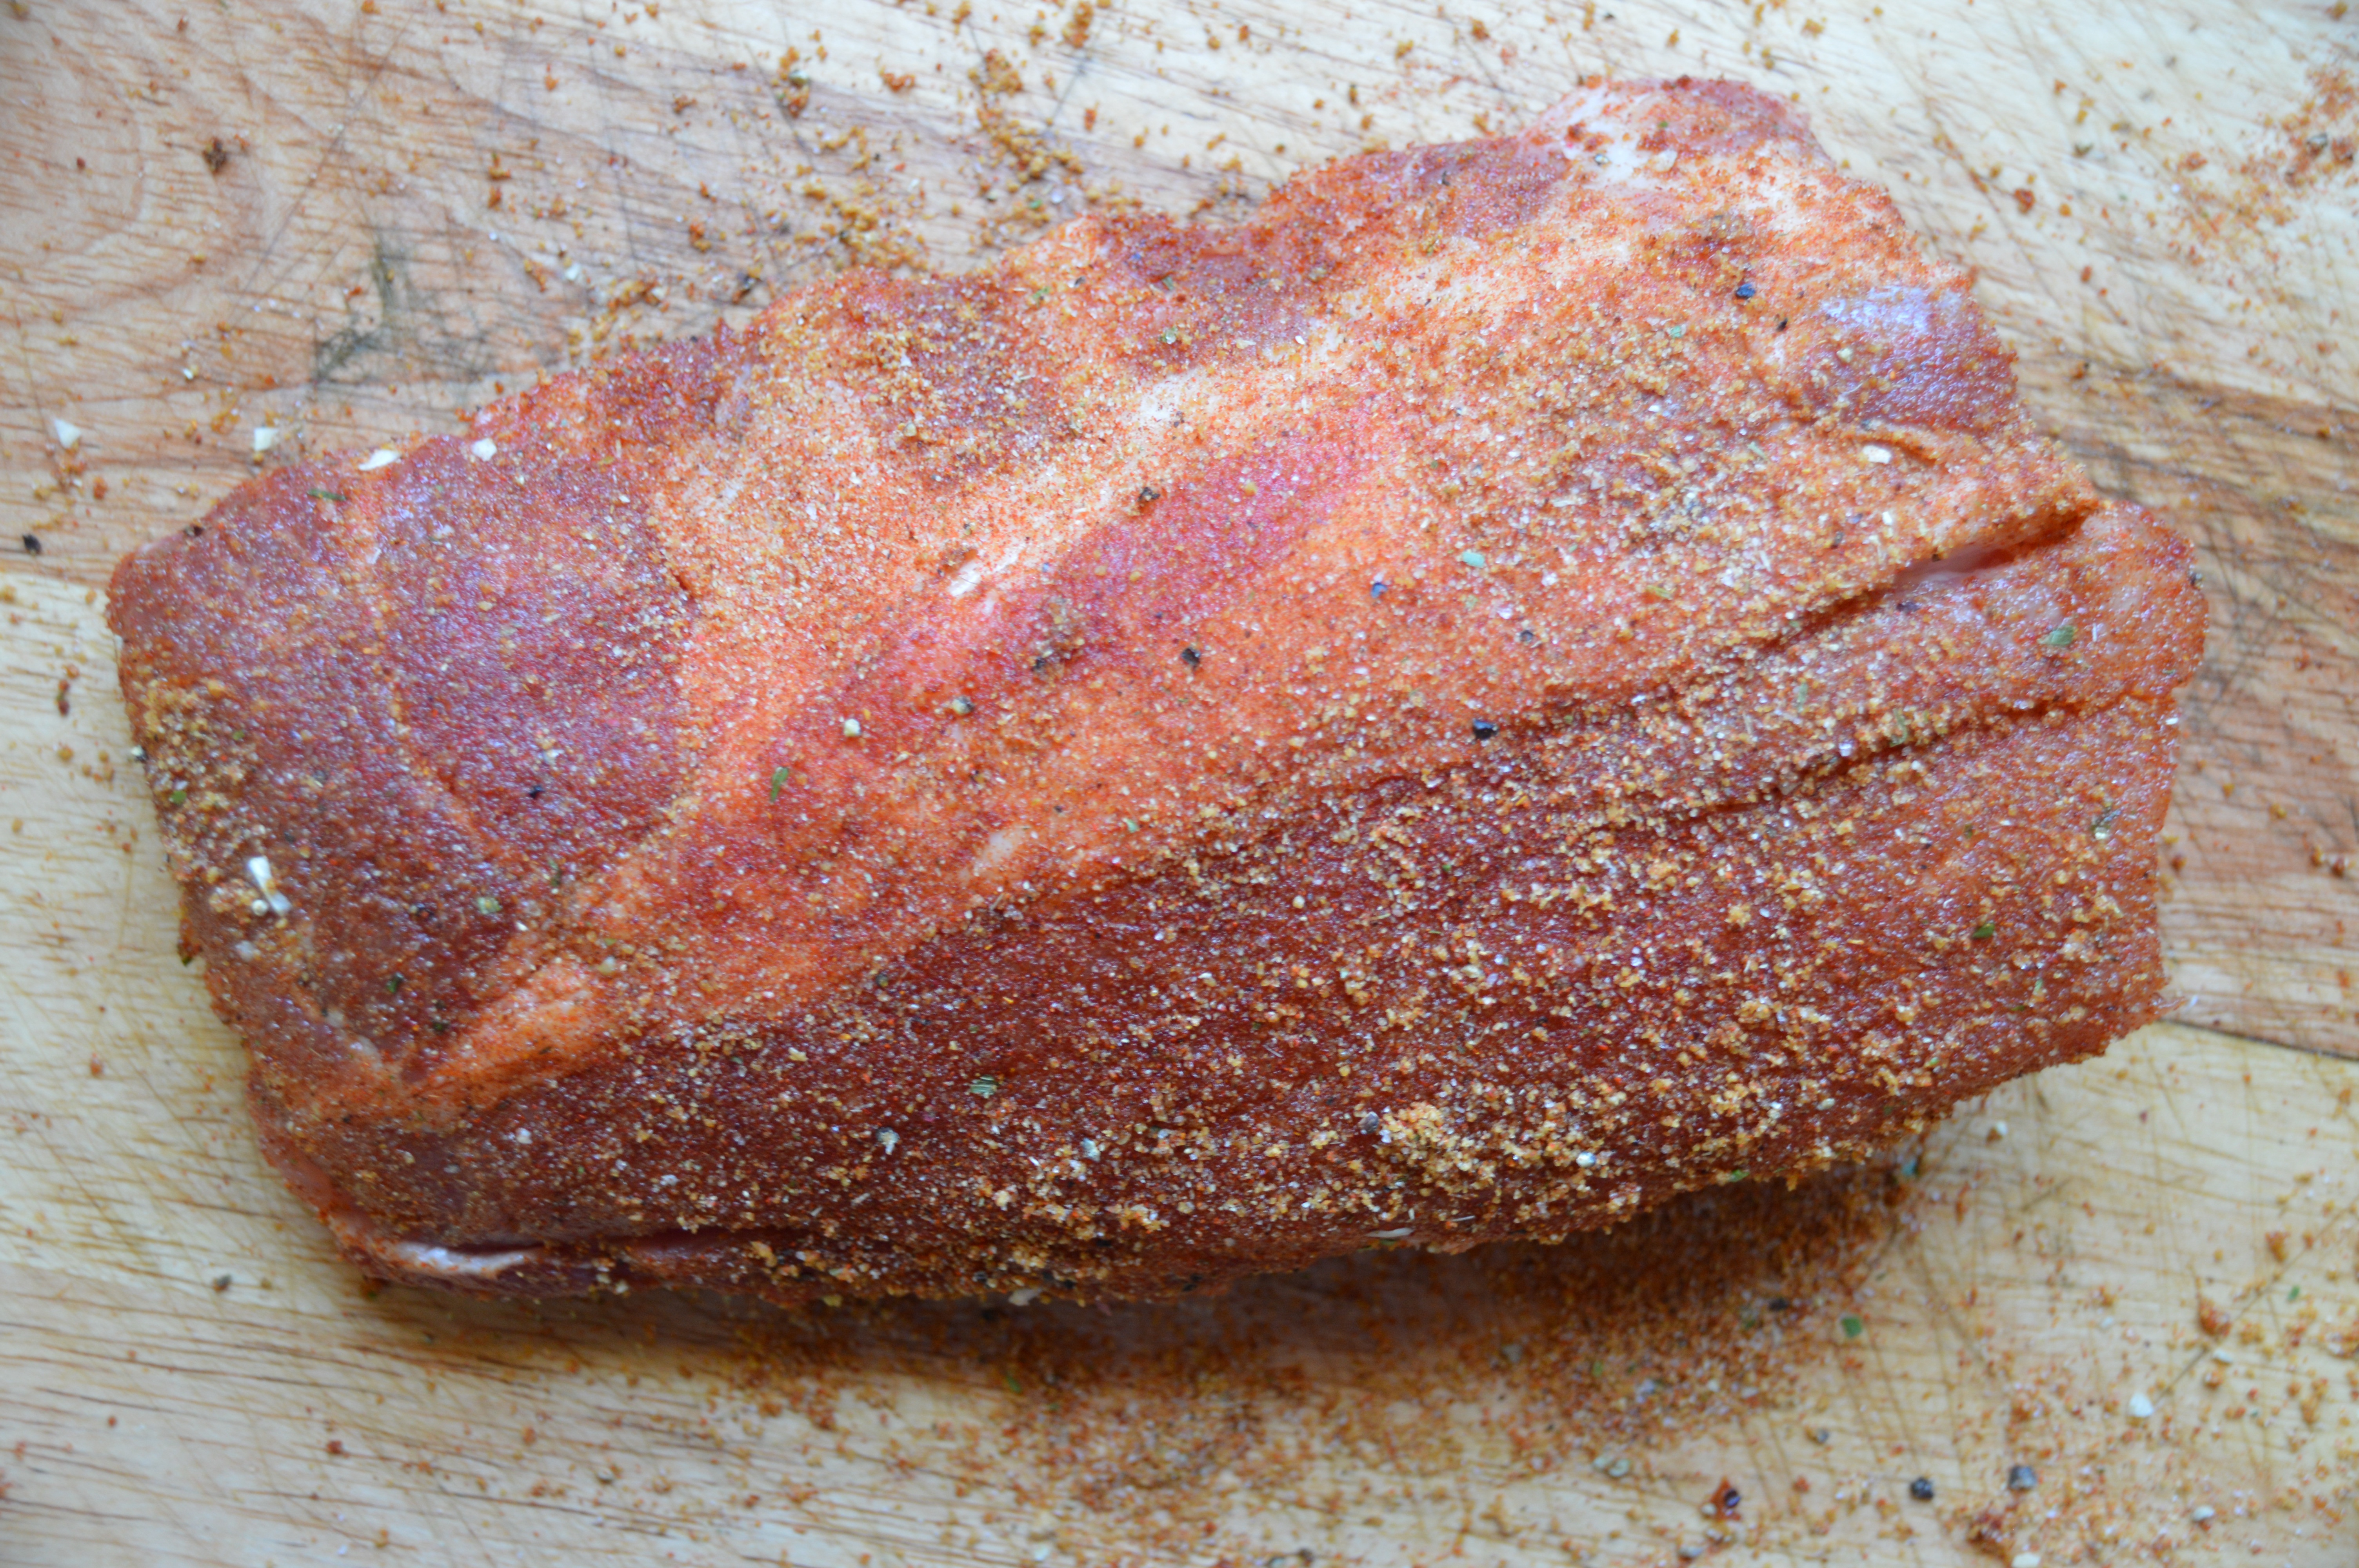 Grilled Pork Ribs + Paleo Rub